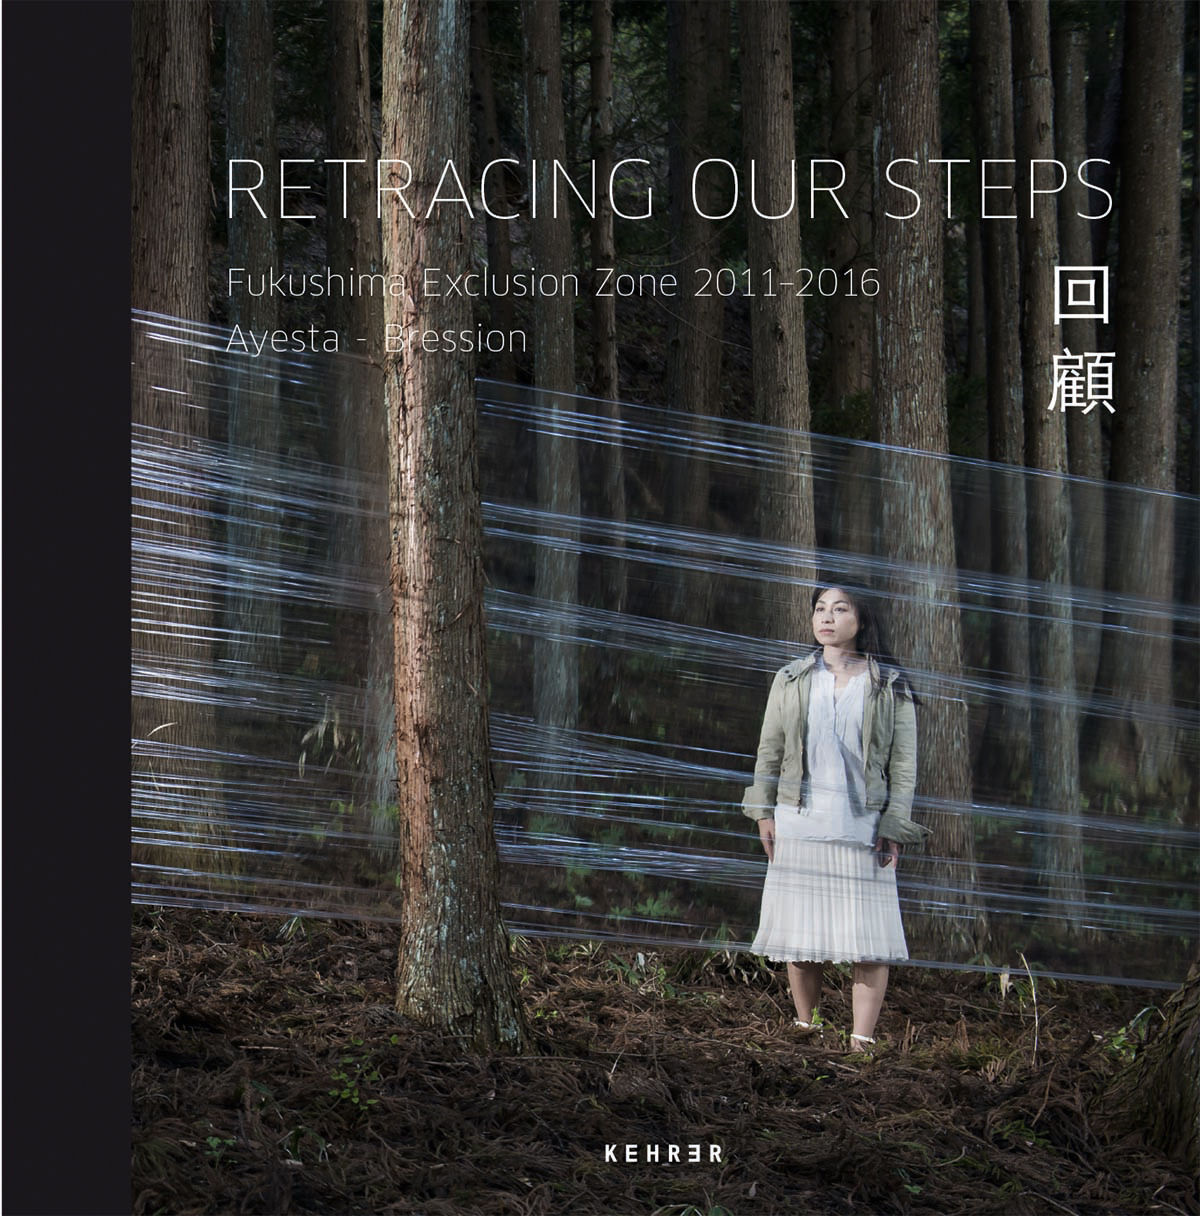 Carlos Ayesta / Guillaume Bression - Retracing Our Steps (KEHRER VERLAG)